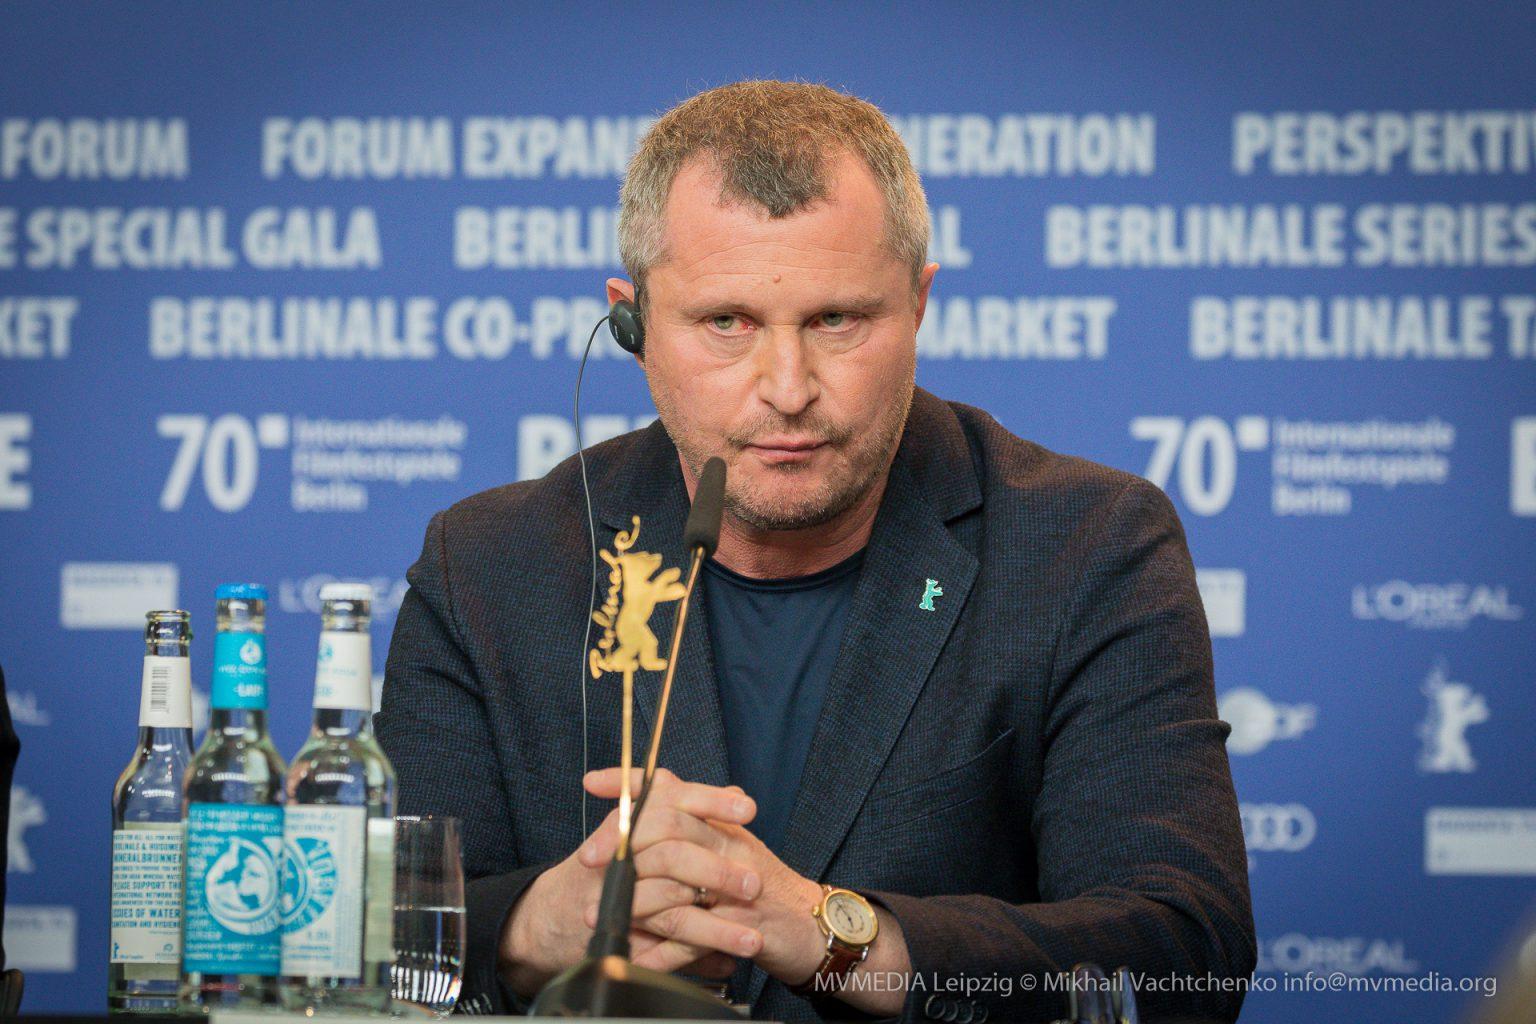 Regisseur Vadim Perelman auf der Pressekonferenz Berlinale Persian Lessons